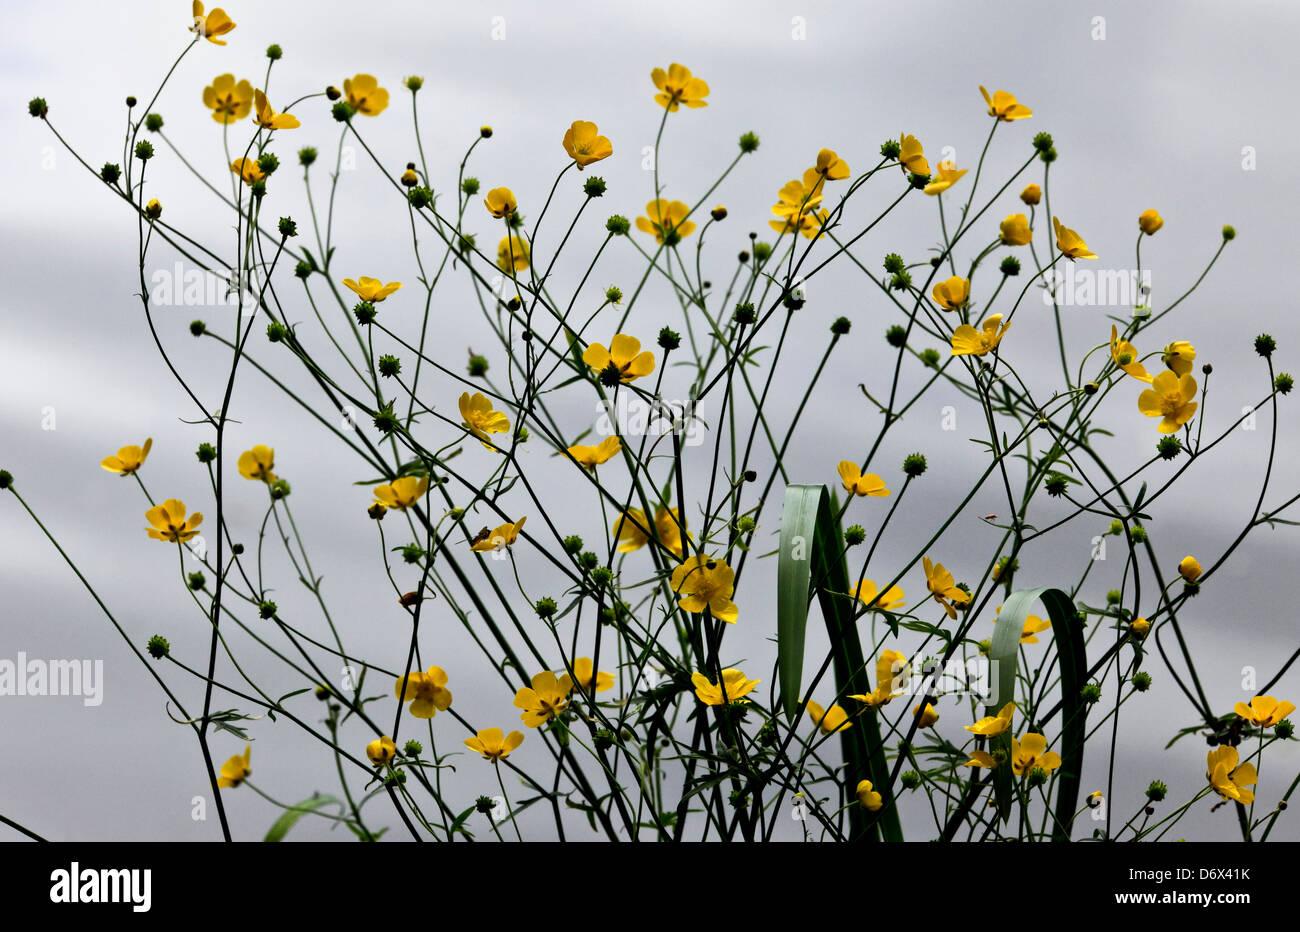 8529. Buttercups, Kent, UK - Stock Image